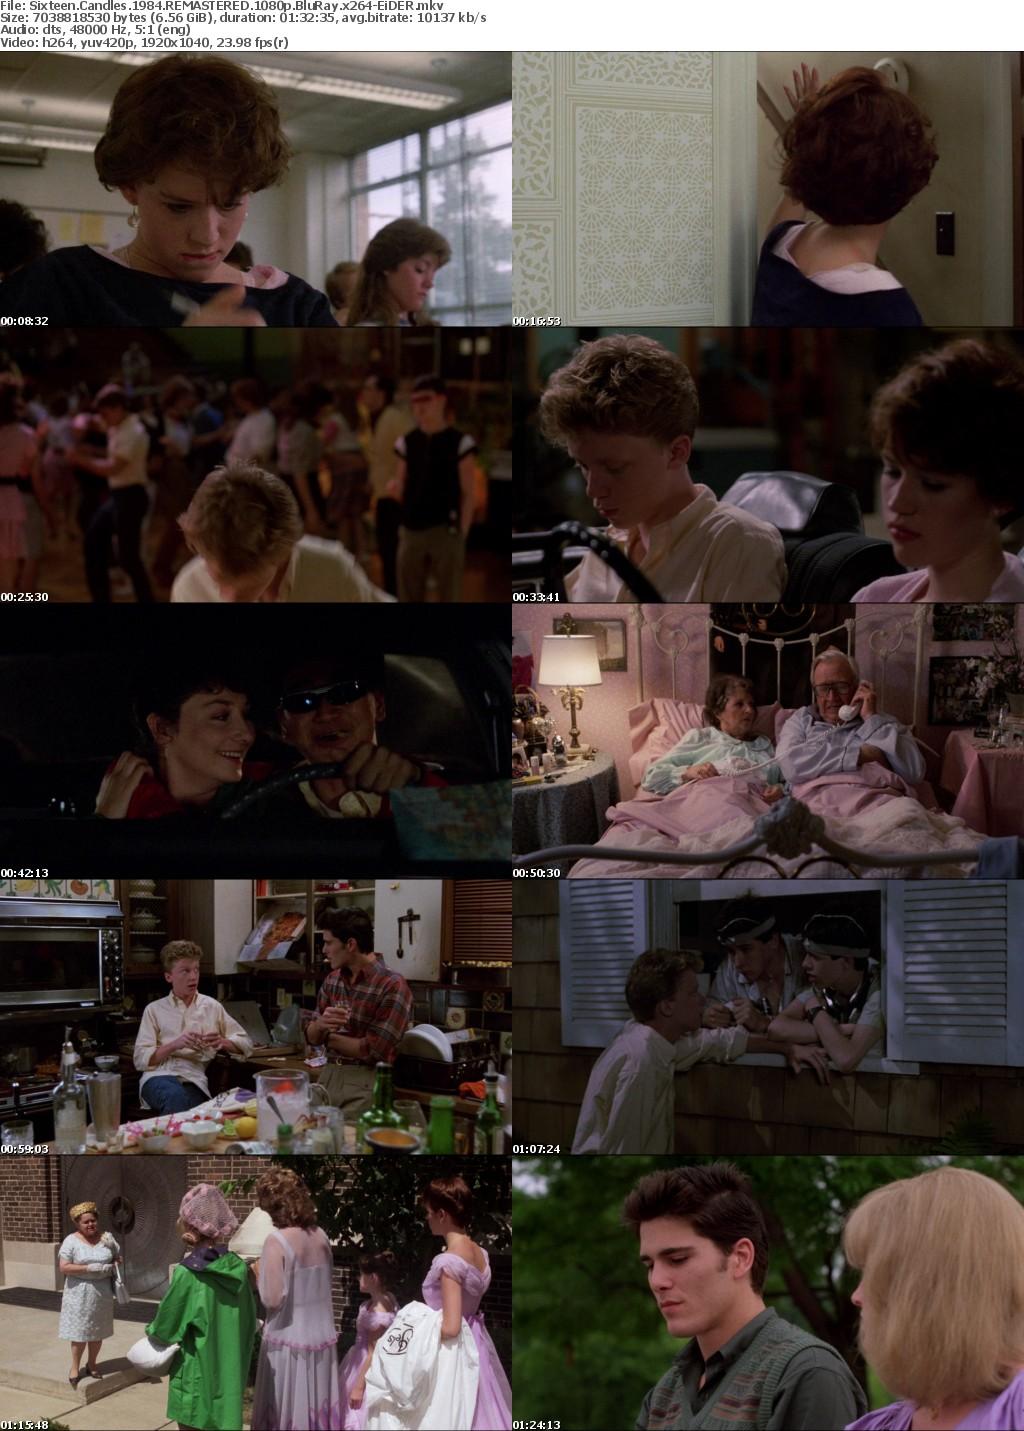 Sixteen Candles 1984 REMASTERED 1080p BluRay x264-EiDER